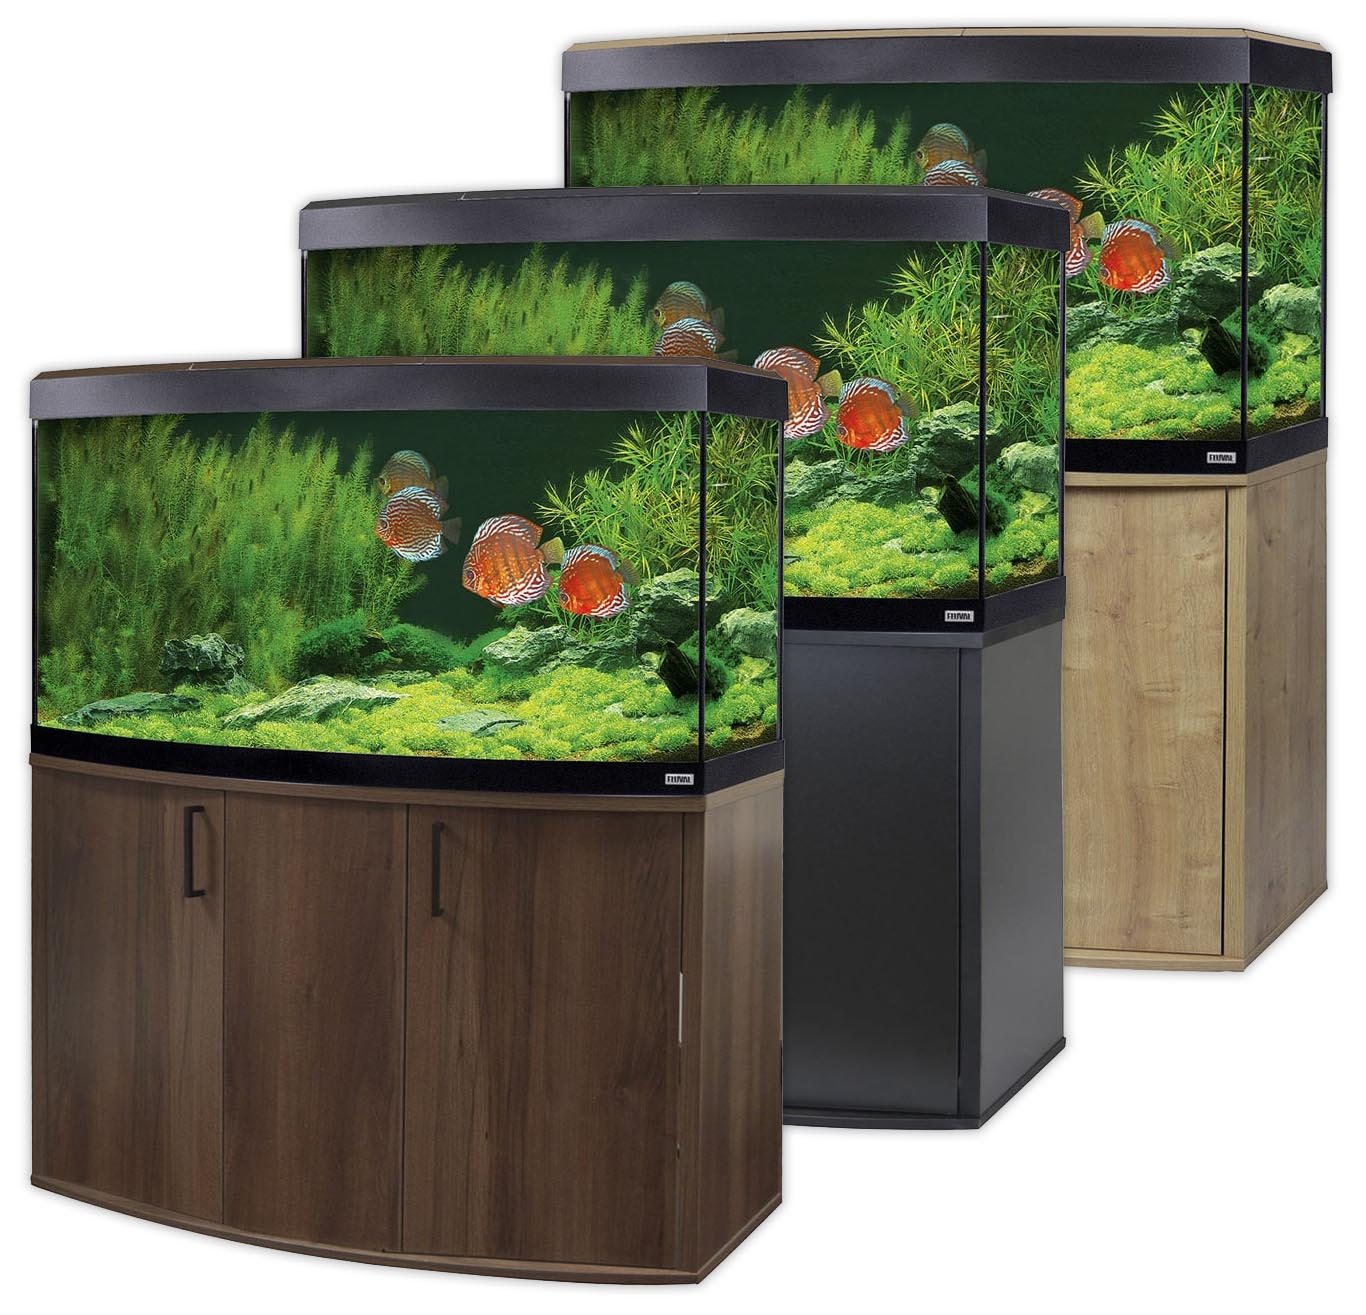 fluval vicenza 260 led aquarium cabinet set bowfront oak walnut black tank ebay. Black Bedroom Furniture Sets. Home Design Ideas